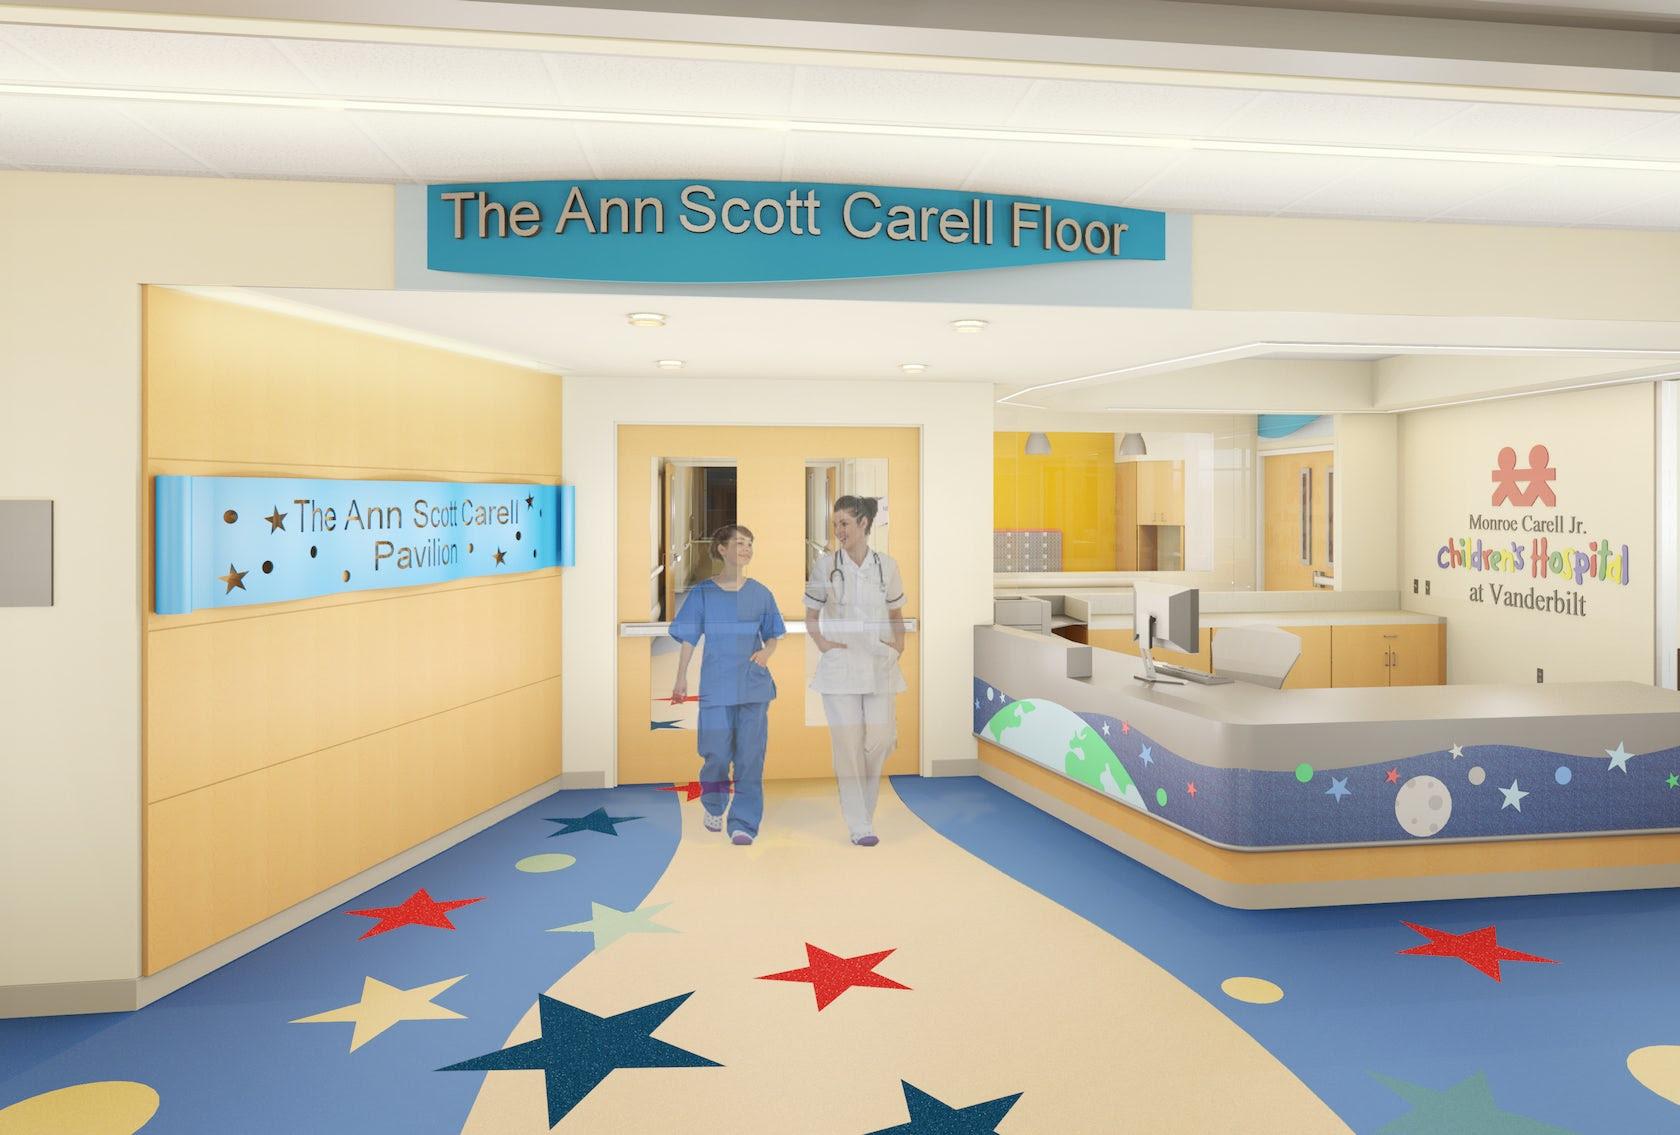 Monroe Carell Jr Children S Hospital At Vanderbilt On Architizer